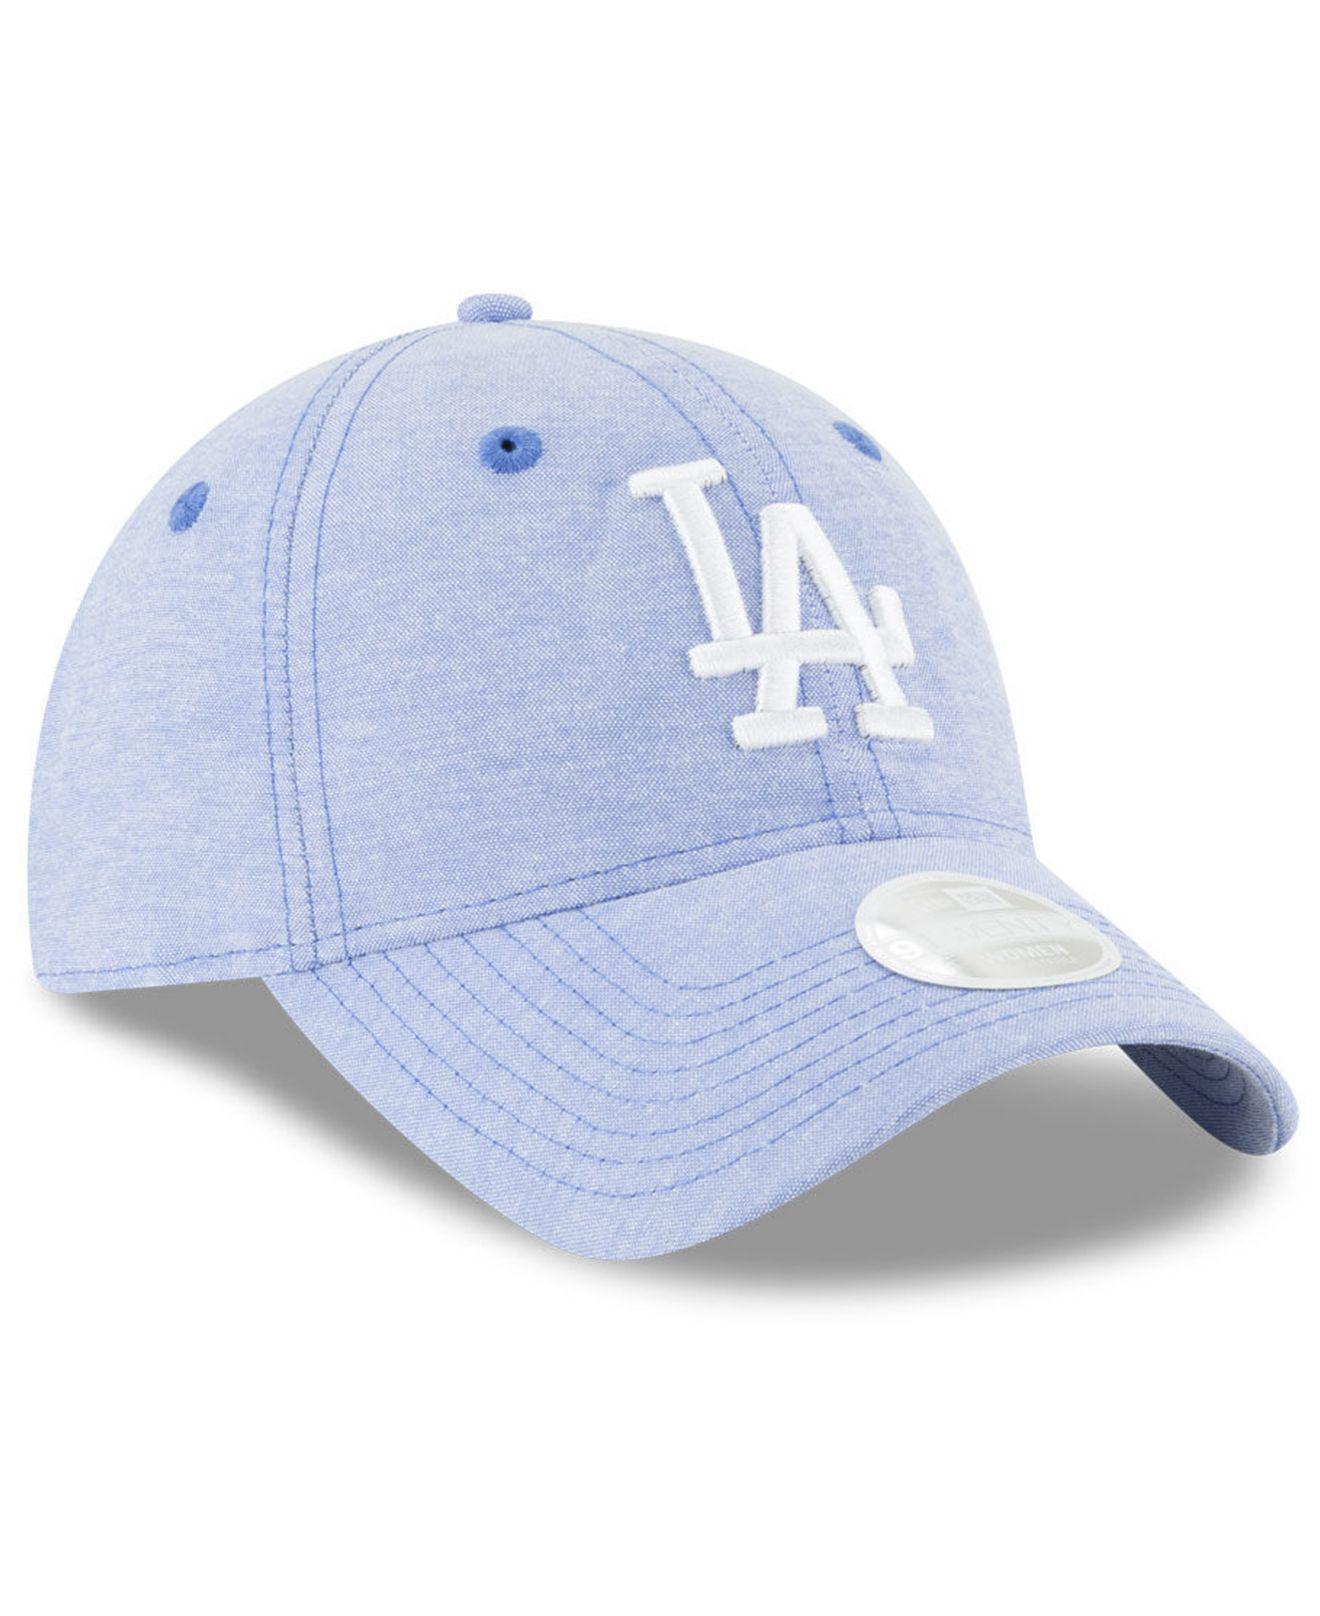 hot sale online 854ef ea2e4 KTZ Los Angeles Dodgers Team Linen 9twenty Strapback Cap in Blue - Lyst